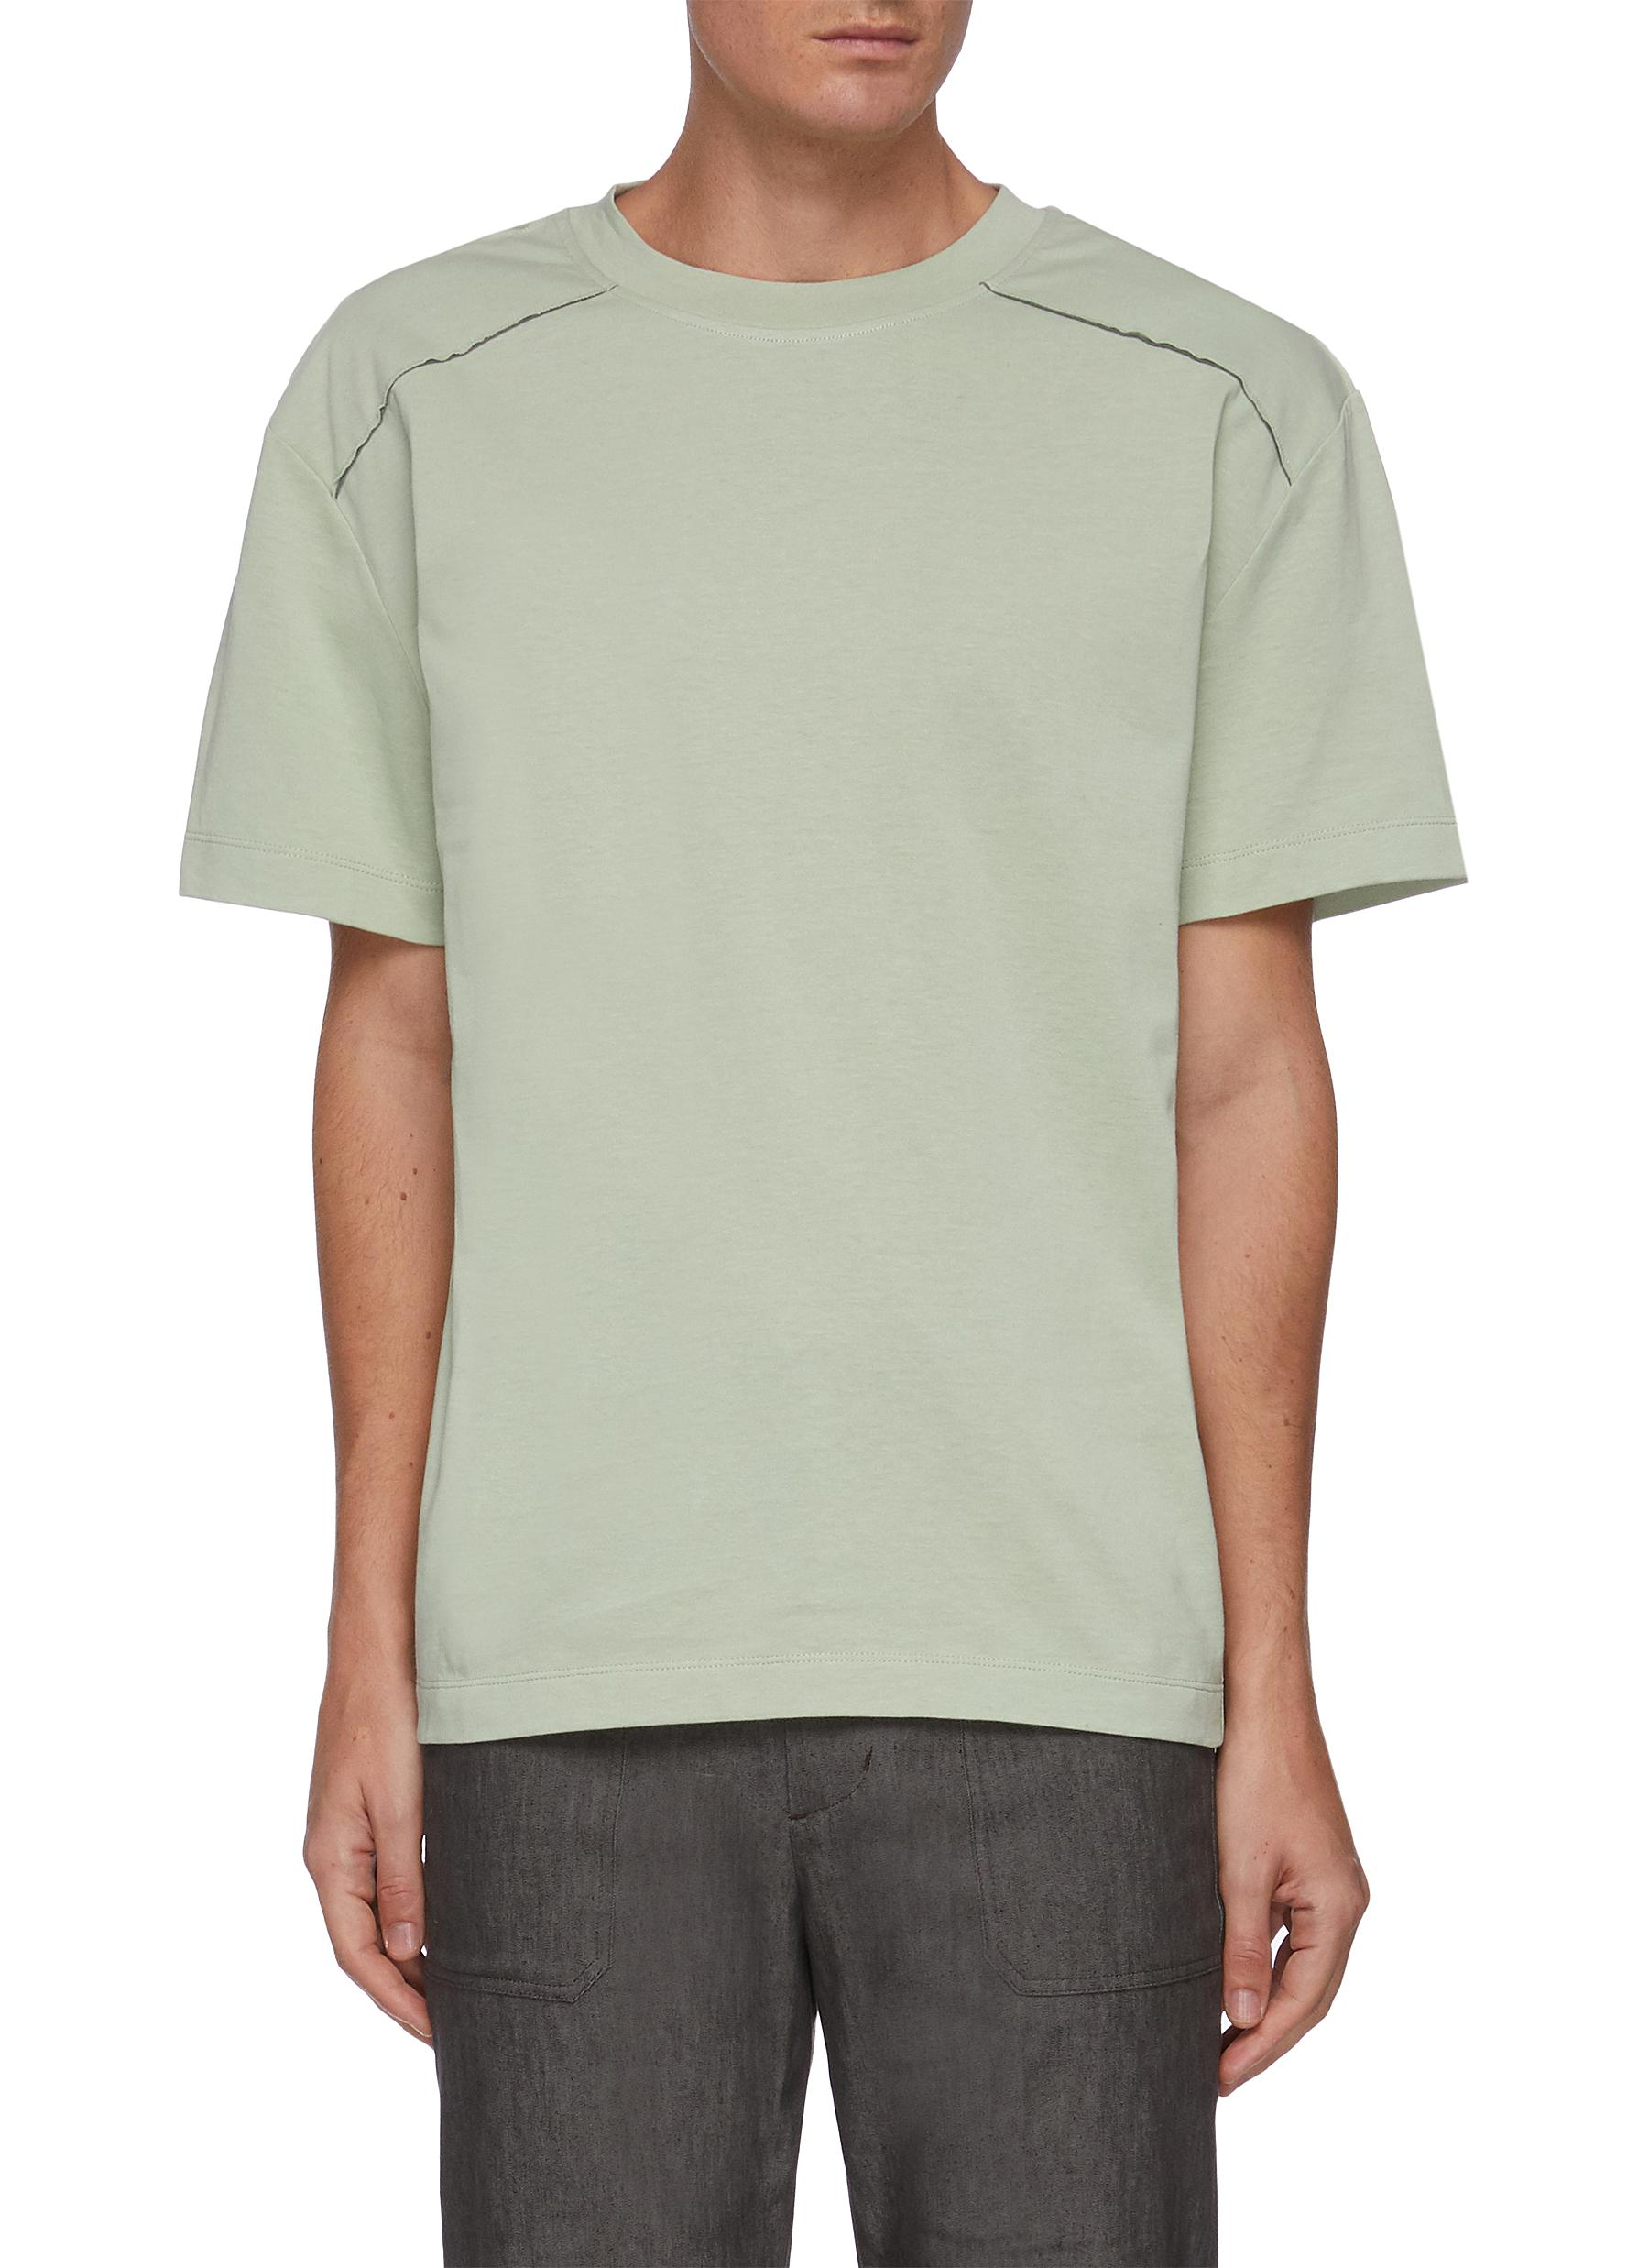 Box cut raw edge T-shirt